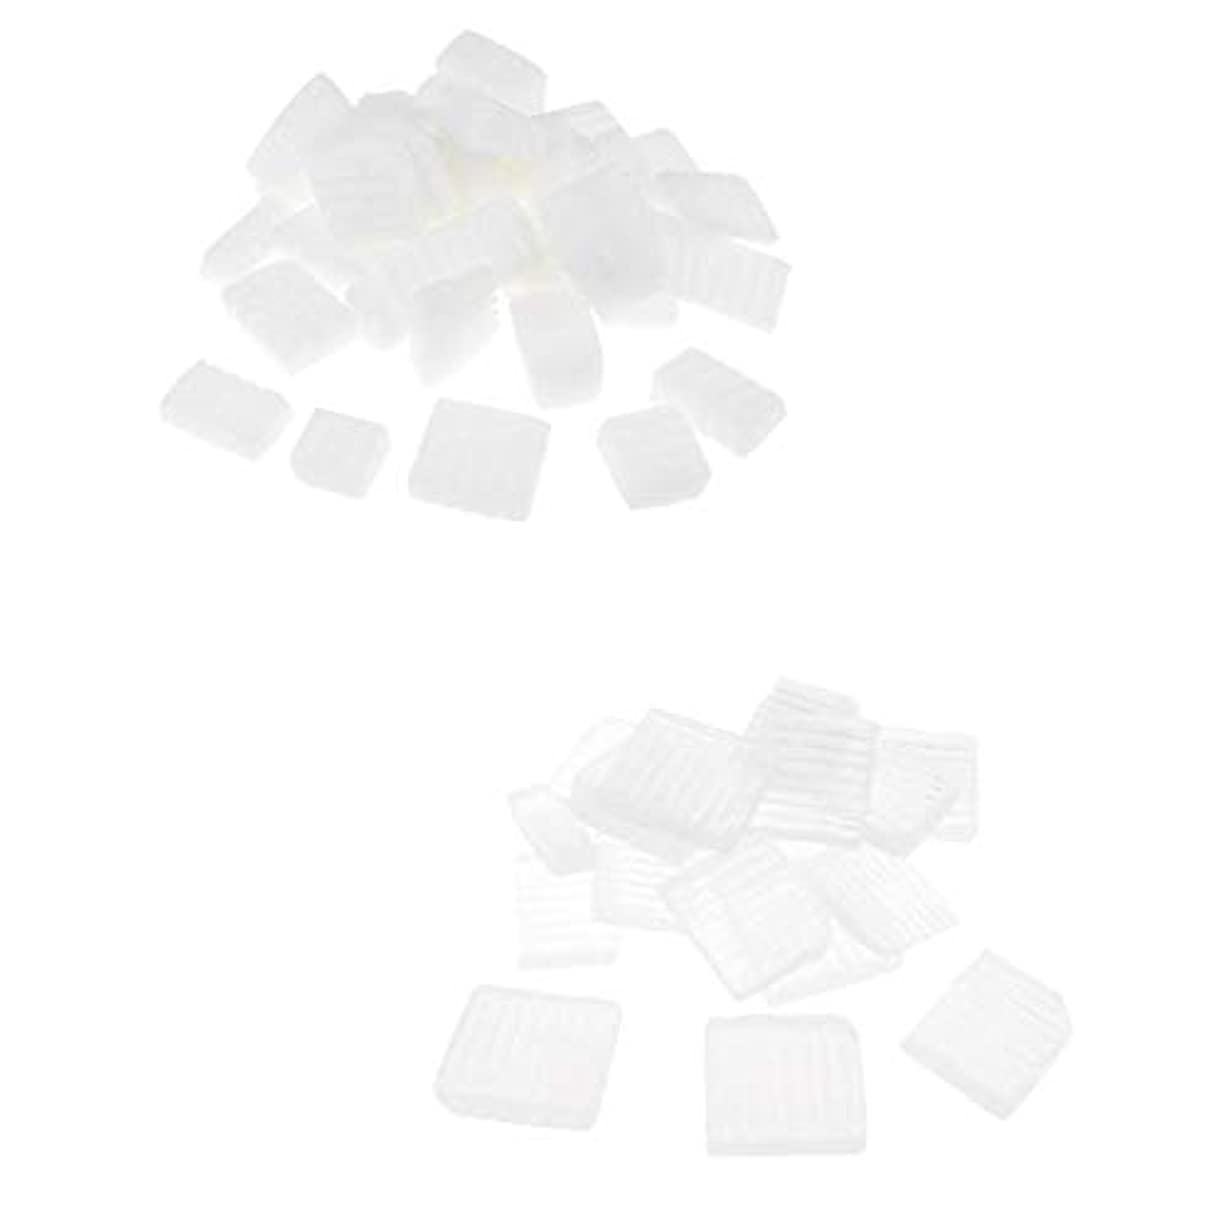 Perfeclan 固形せっけん ホワイト透明 手芸 バス用品 手作り ハンドメイド 石鹸製造 安全健康 2種混合